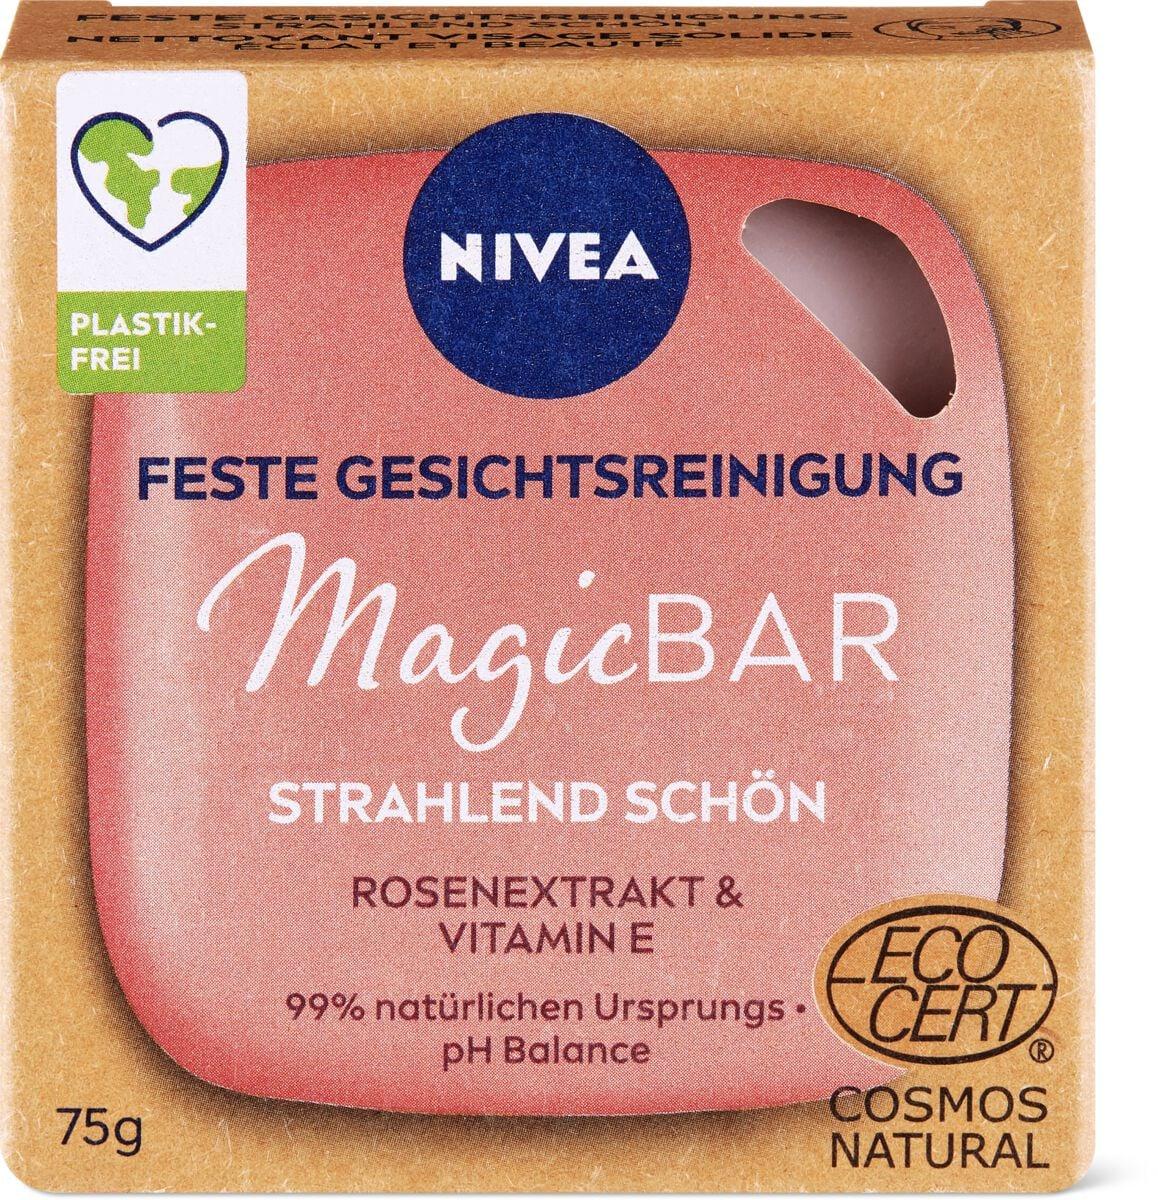 Nivea Magic Bar Rayonnant